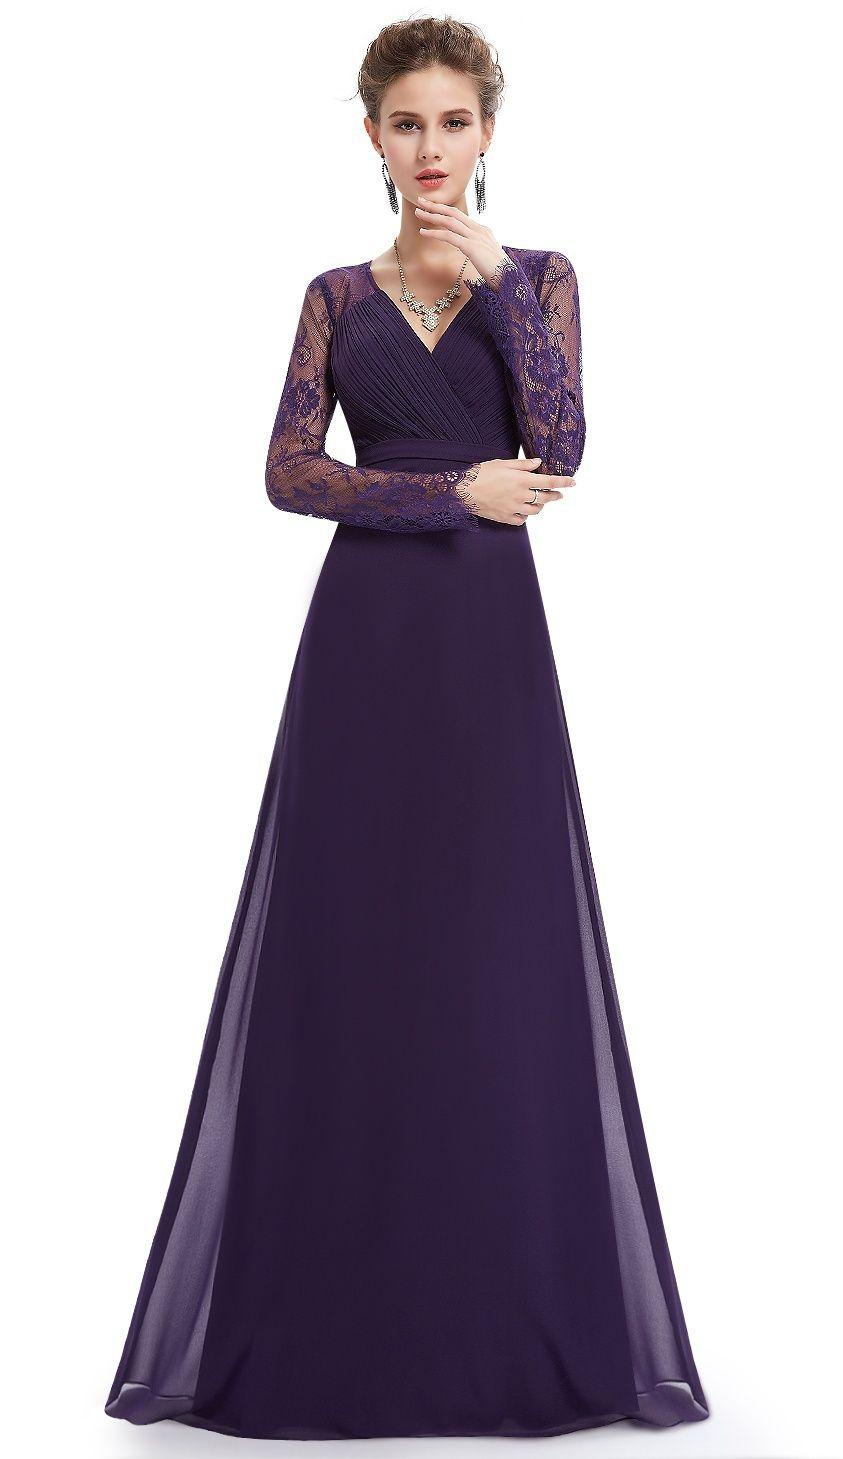 Ever Pretty Ever Pretty Women S Elegant Full Length Wedding Guest Dresses For Women 08692 Dark Purple Us12 Walmart Com Long Sleeve Lace Bridesmaid Dresses Prom Dresses Long With Sleeves Gorgeous Prom Dresses [ 1459 x 843 Pixel ]